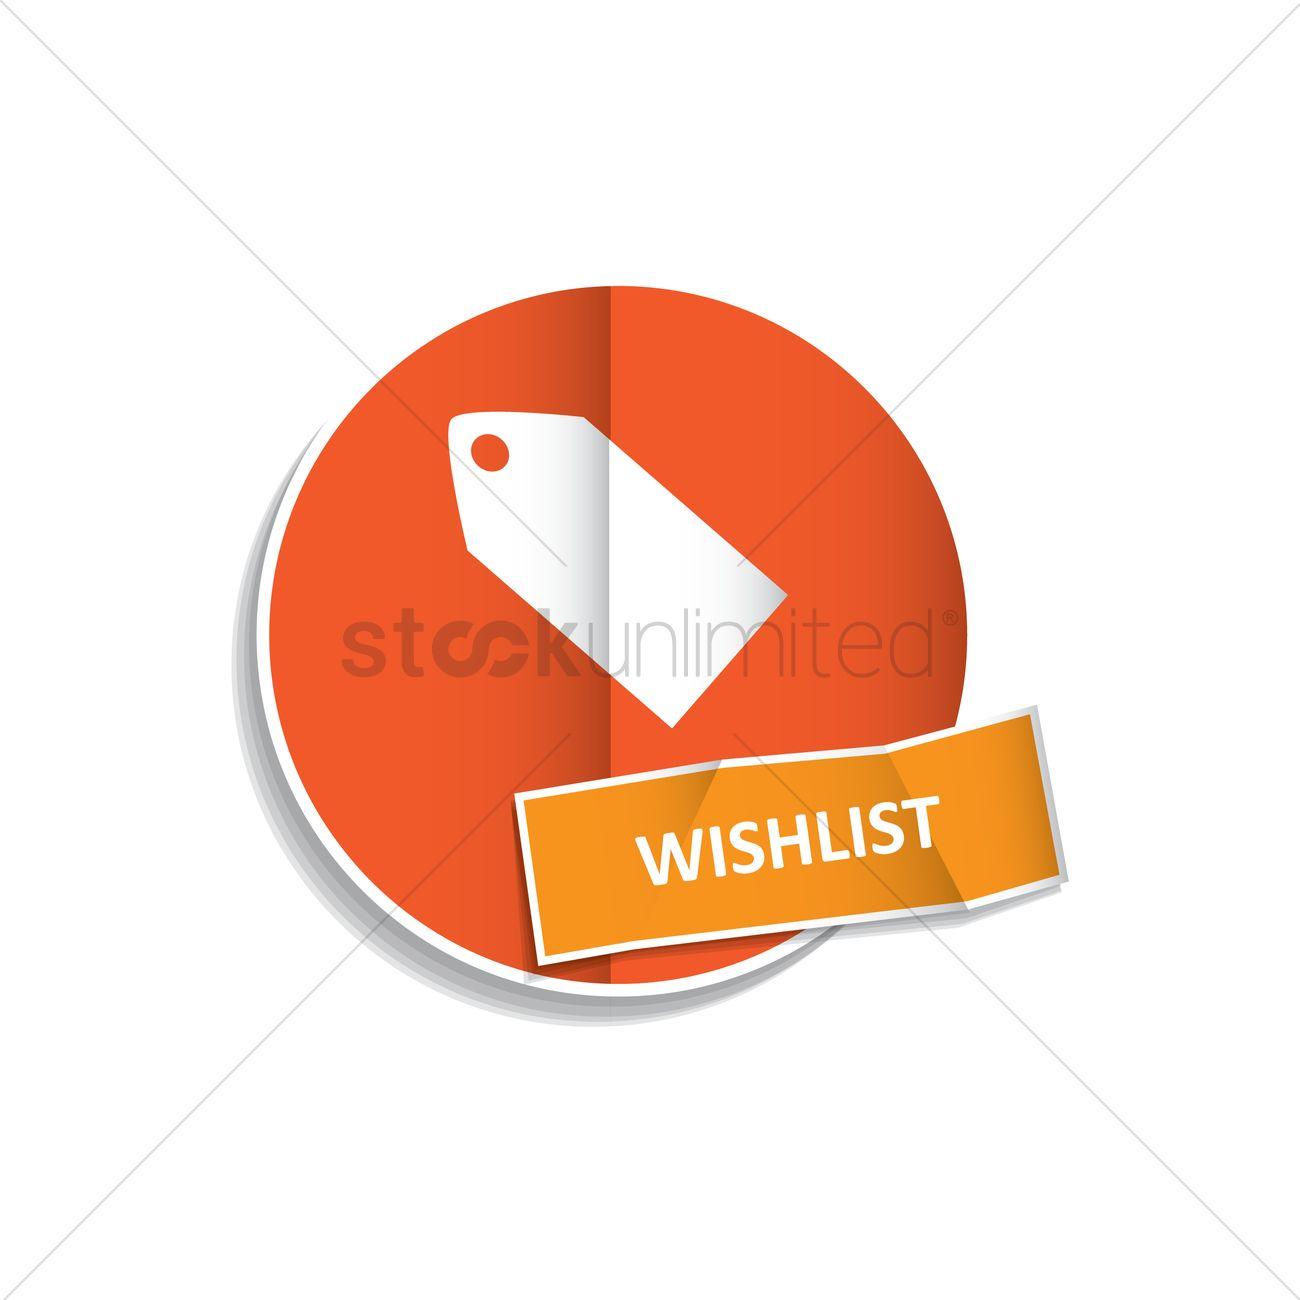 977fff85f4b34 Free Wishlist button Vector Image - 1325768 | StockUnlimited